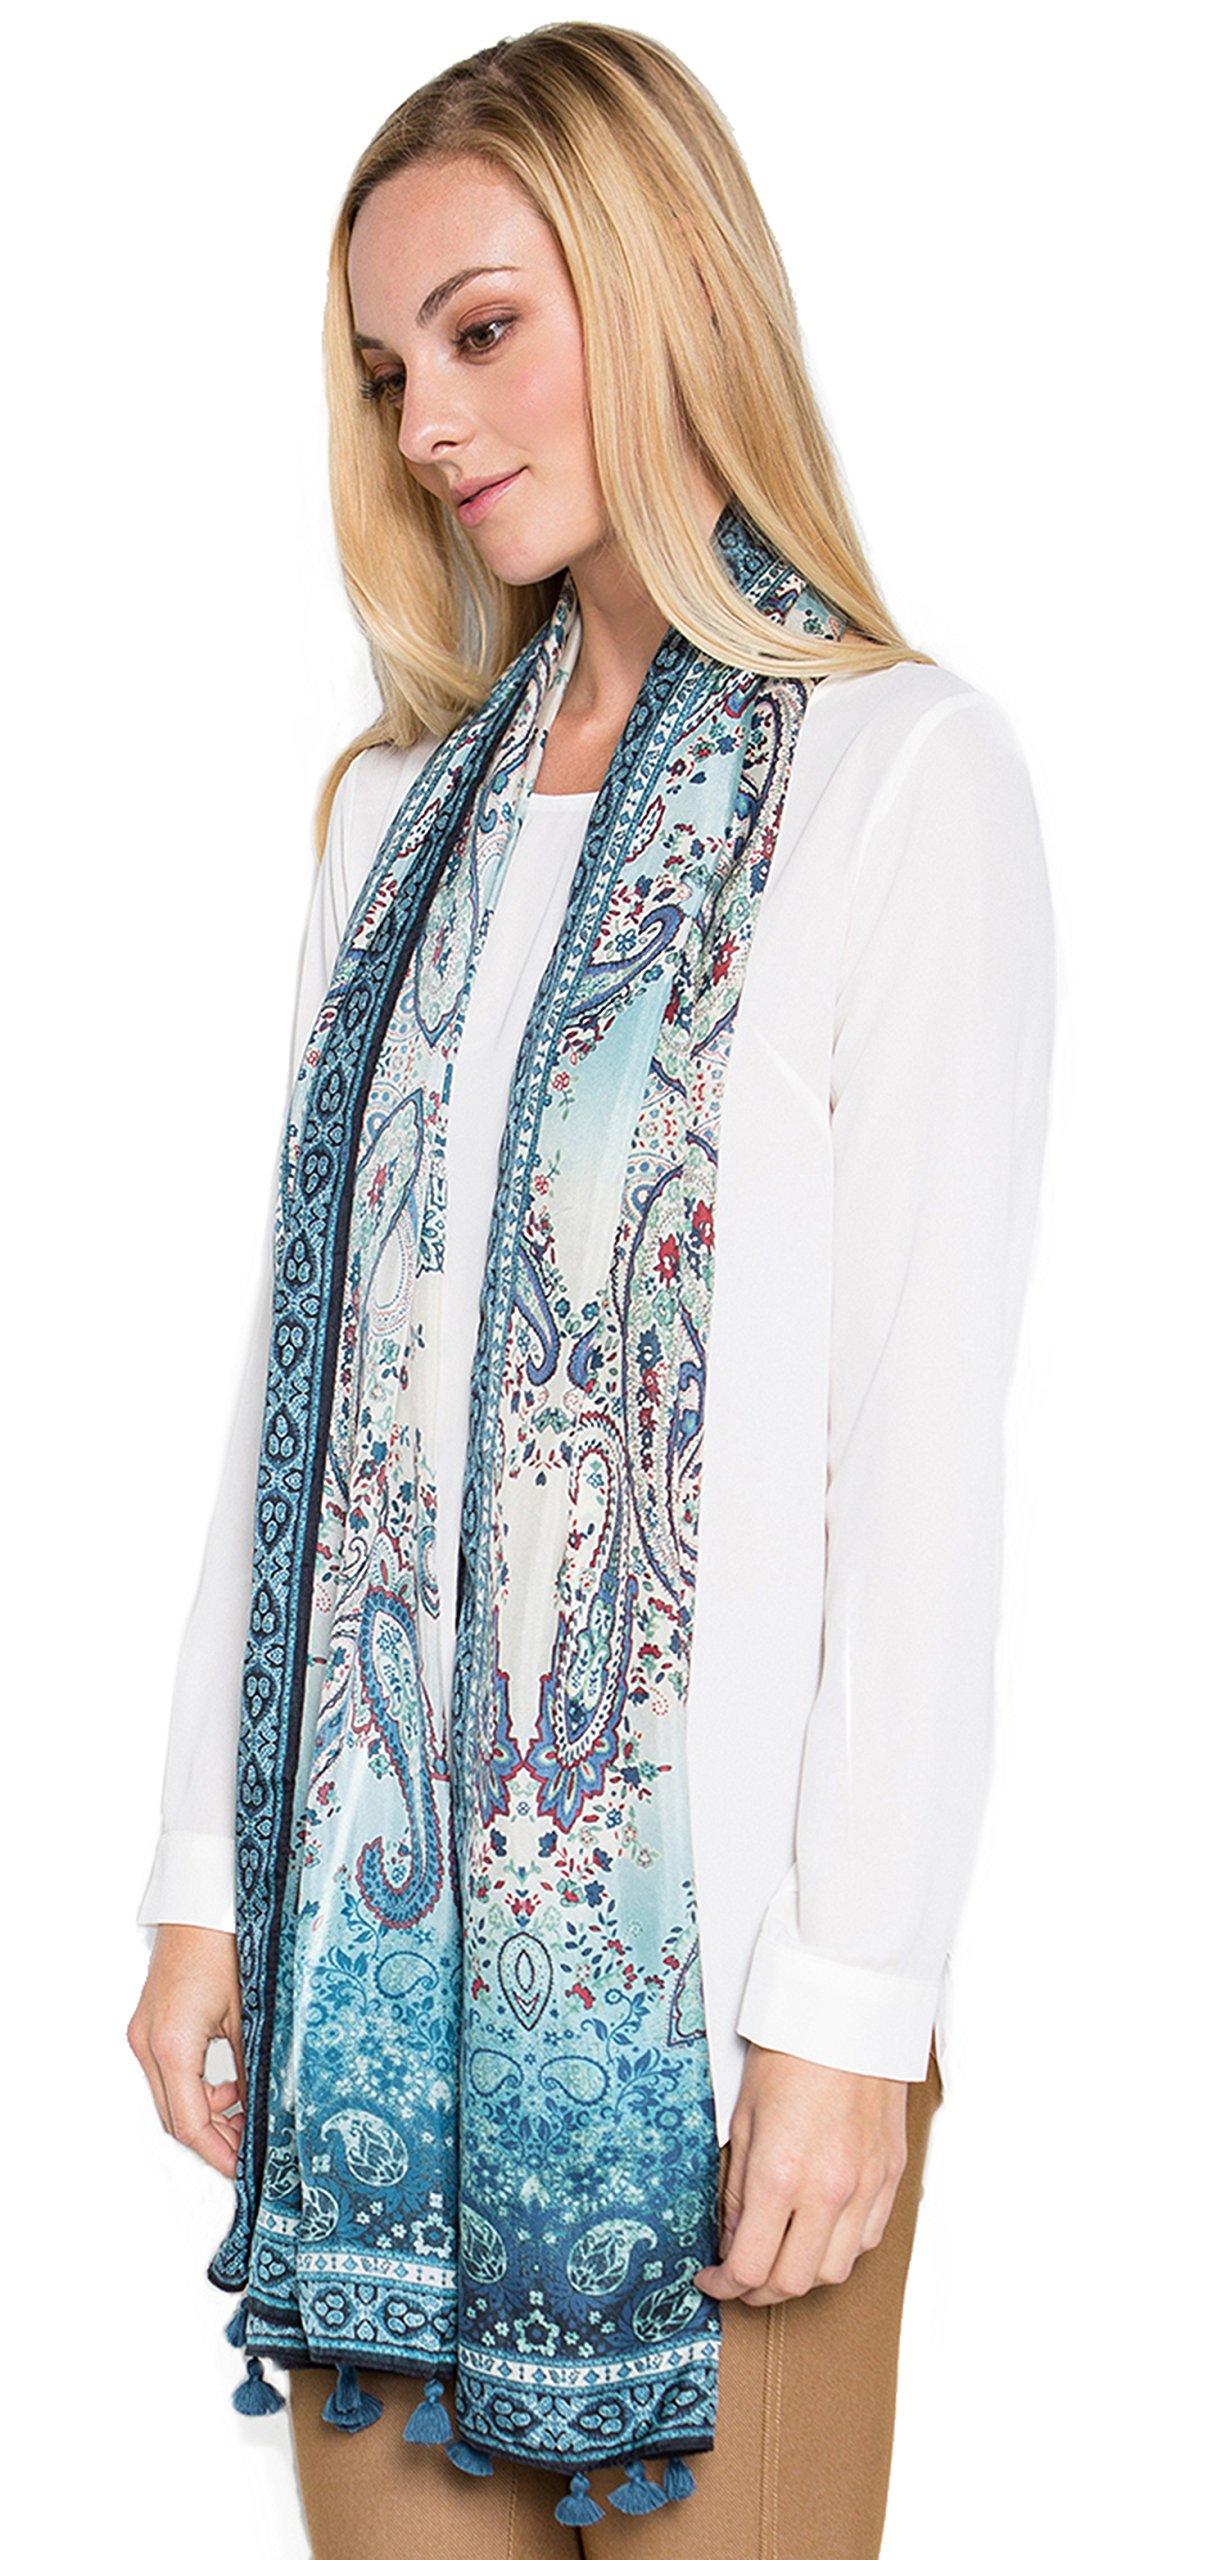 Fine Silk Scarf for Women-Luxury Fashion Print Extra Long Lightweight Wrap Shawl Headscarf by d'IRIS (Image #6)